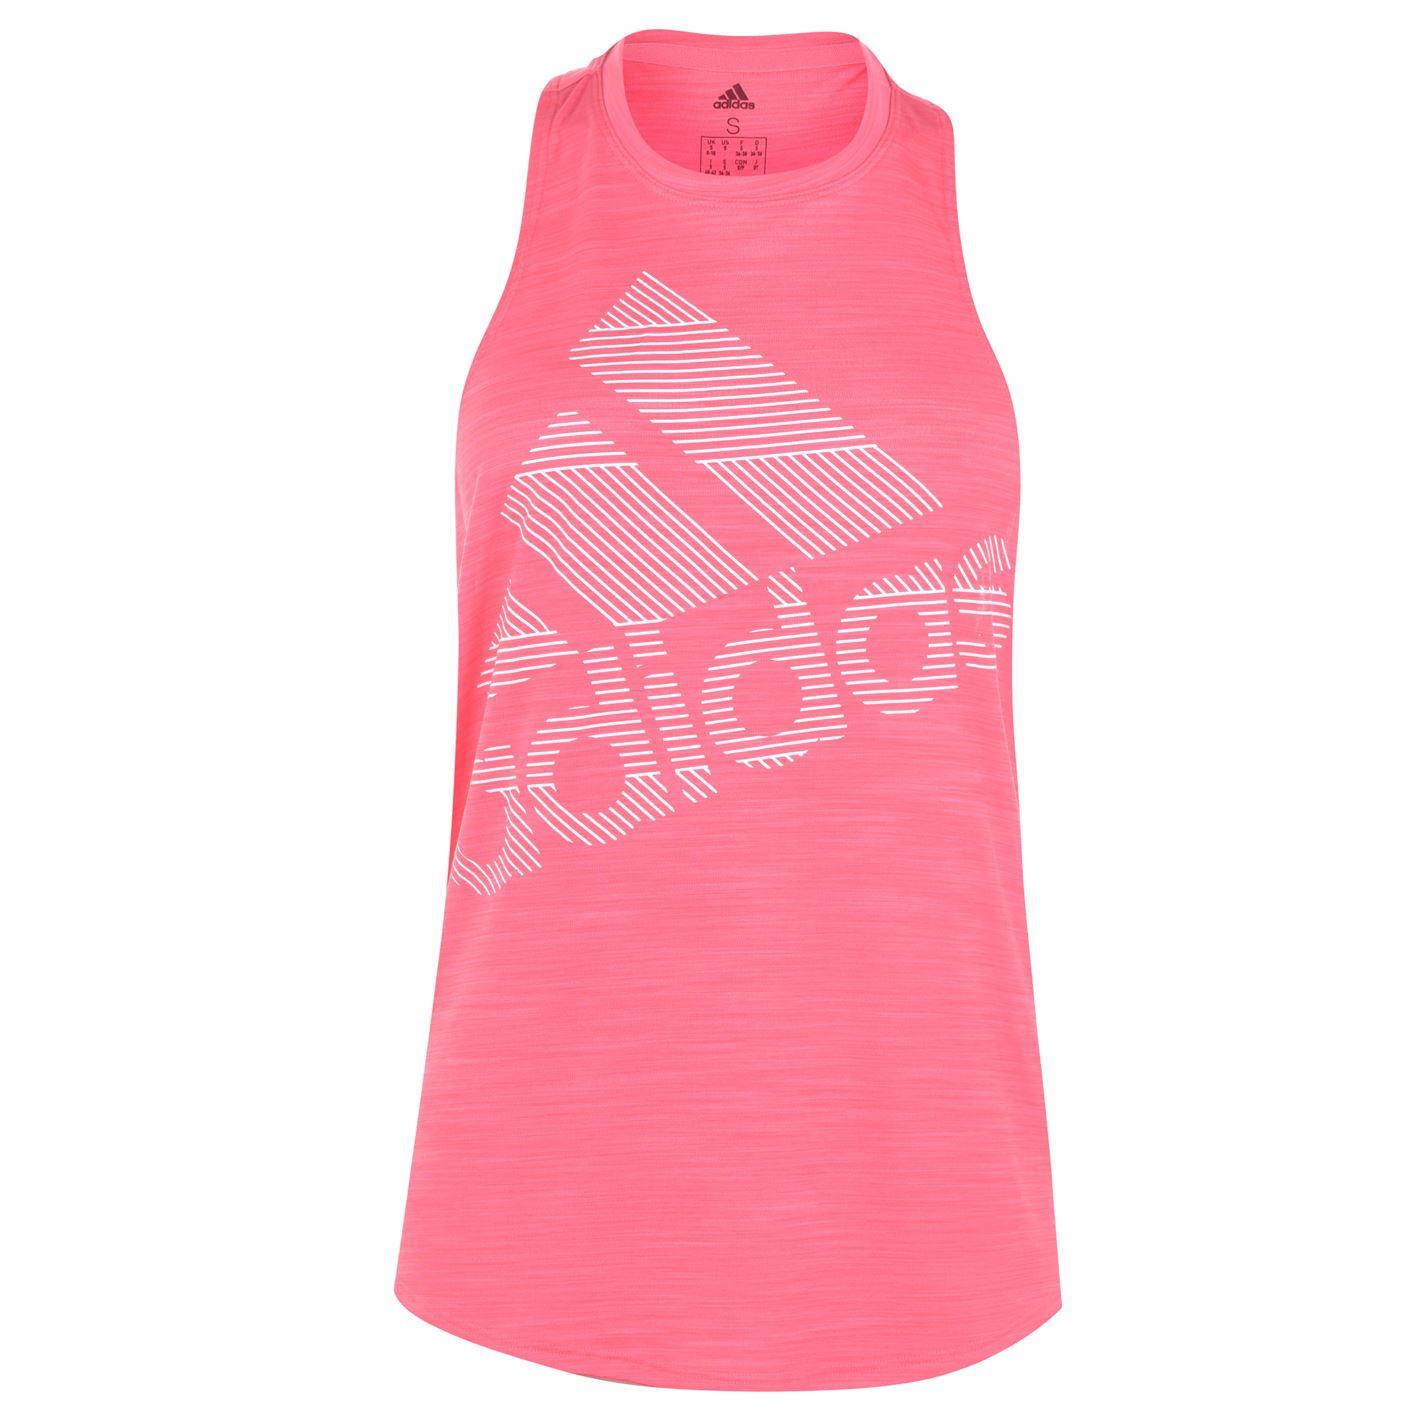 Adidas MH BOS Tank Top Ladies